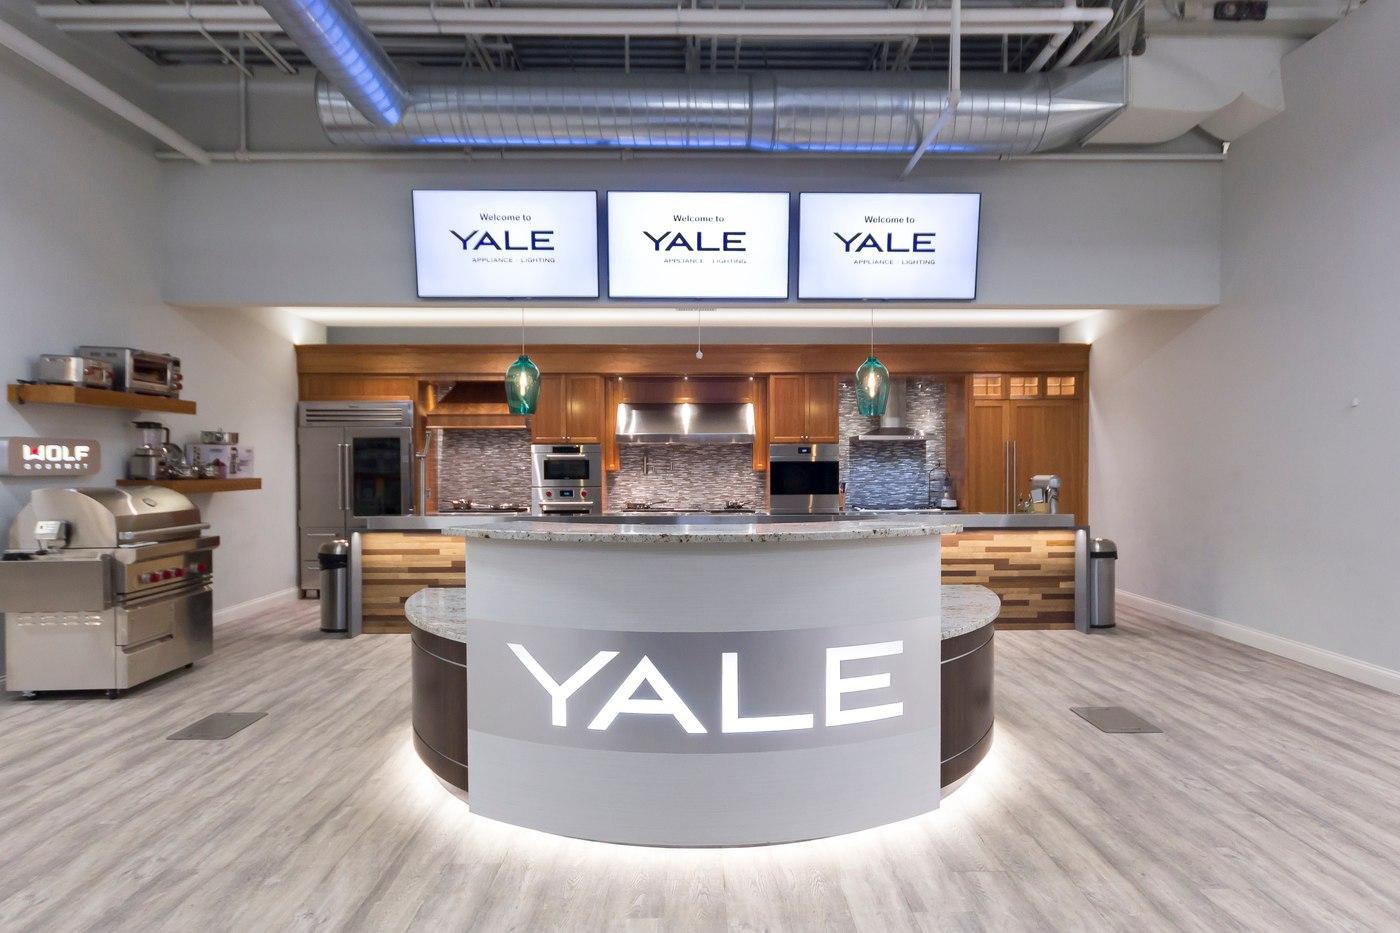 yale appliance is hiring